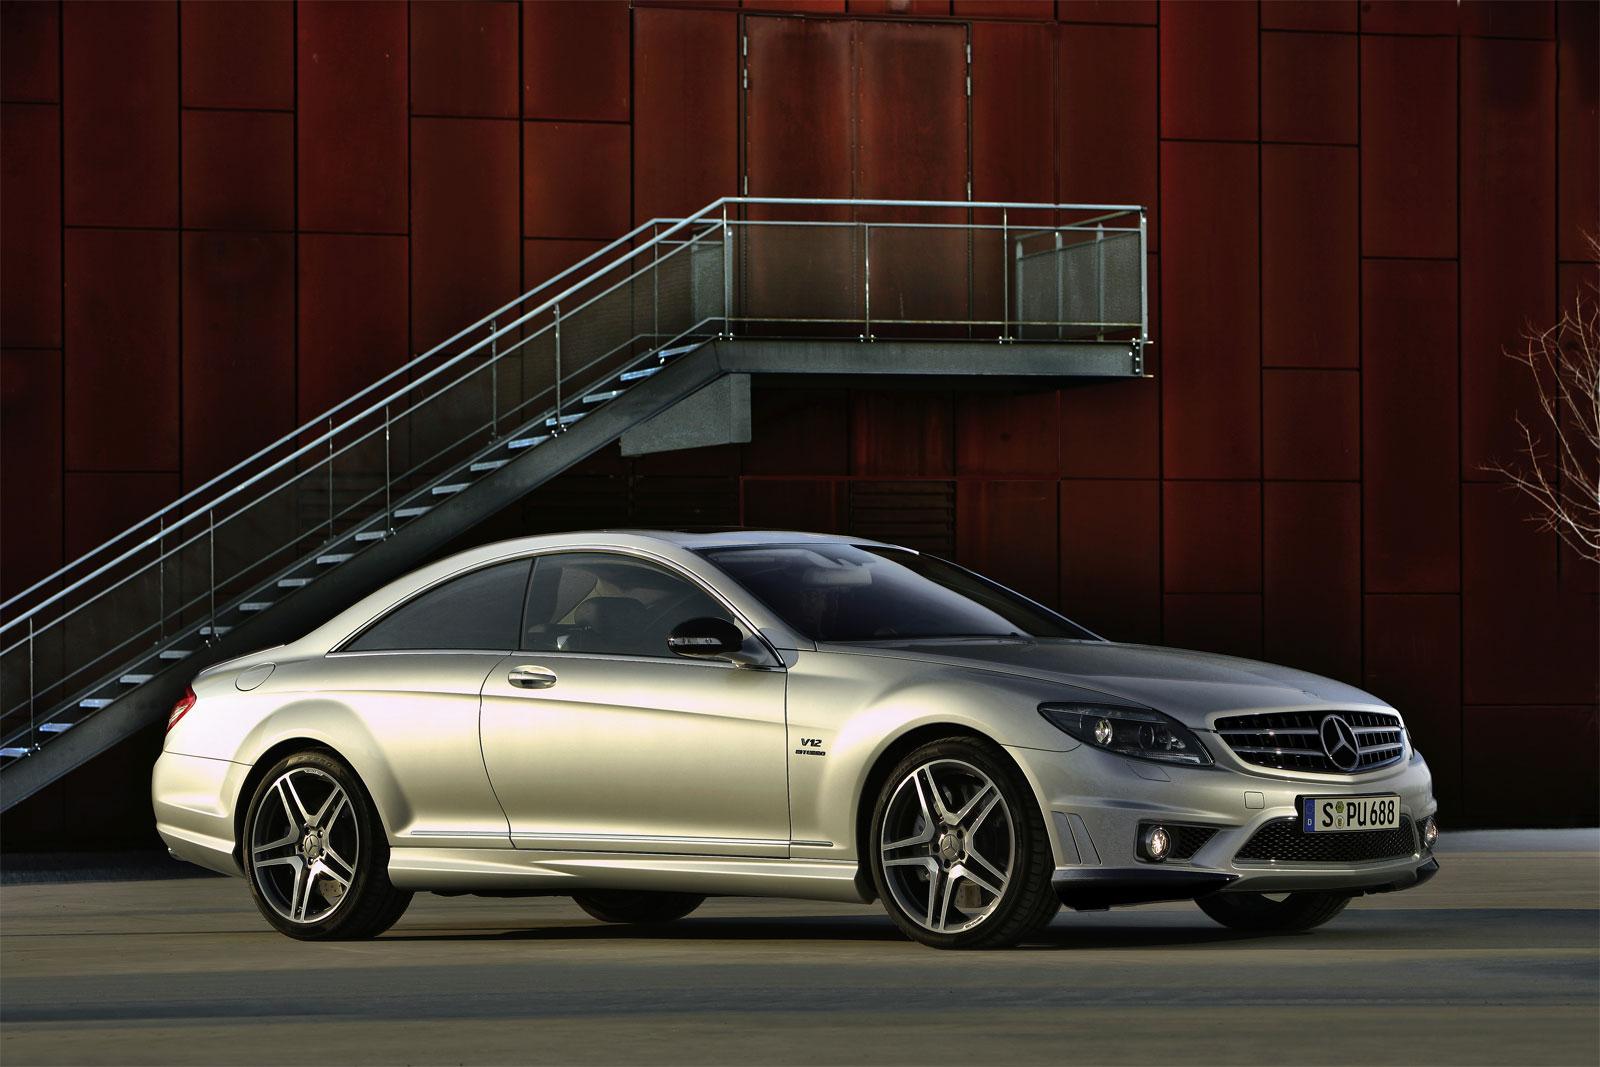 http://2.bp.blogspot.com/-YuaFqBgPpx8/TrEc9eYAolI/AAAAAAAAFcY/KNdg6L-wqVs/s1600/Mercedes+CL65+AMG+2.jpg